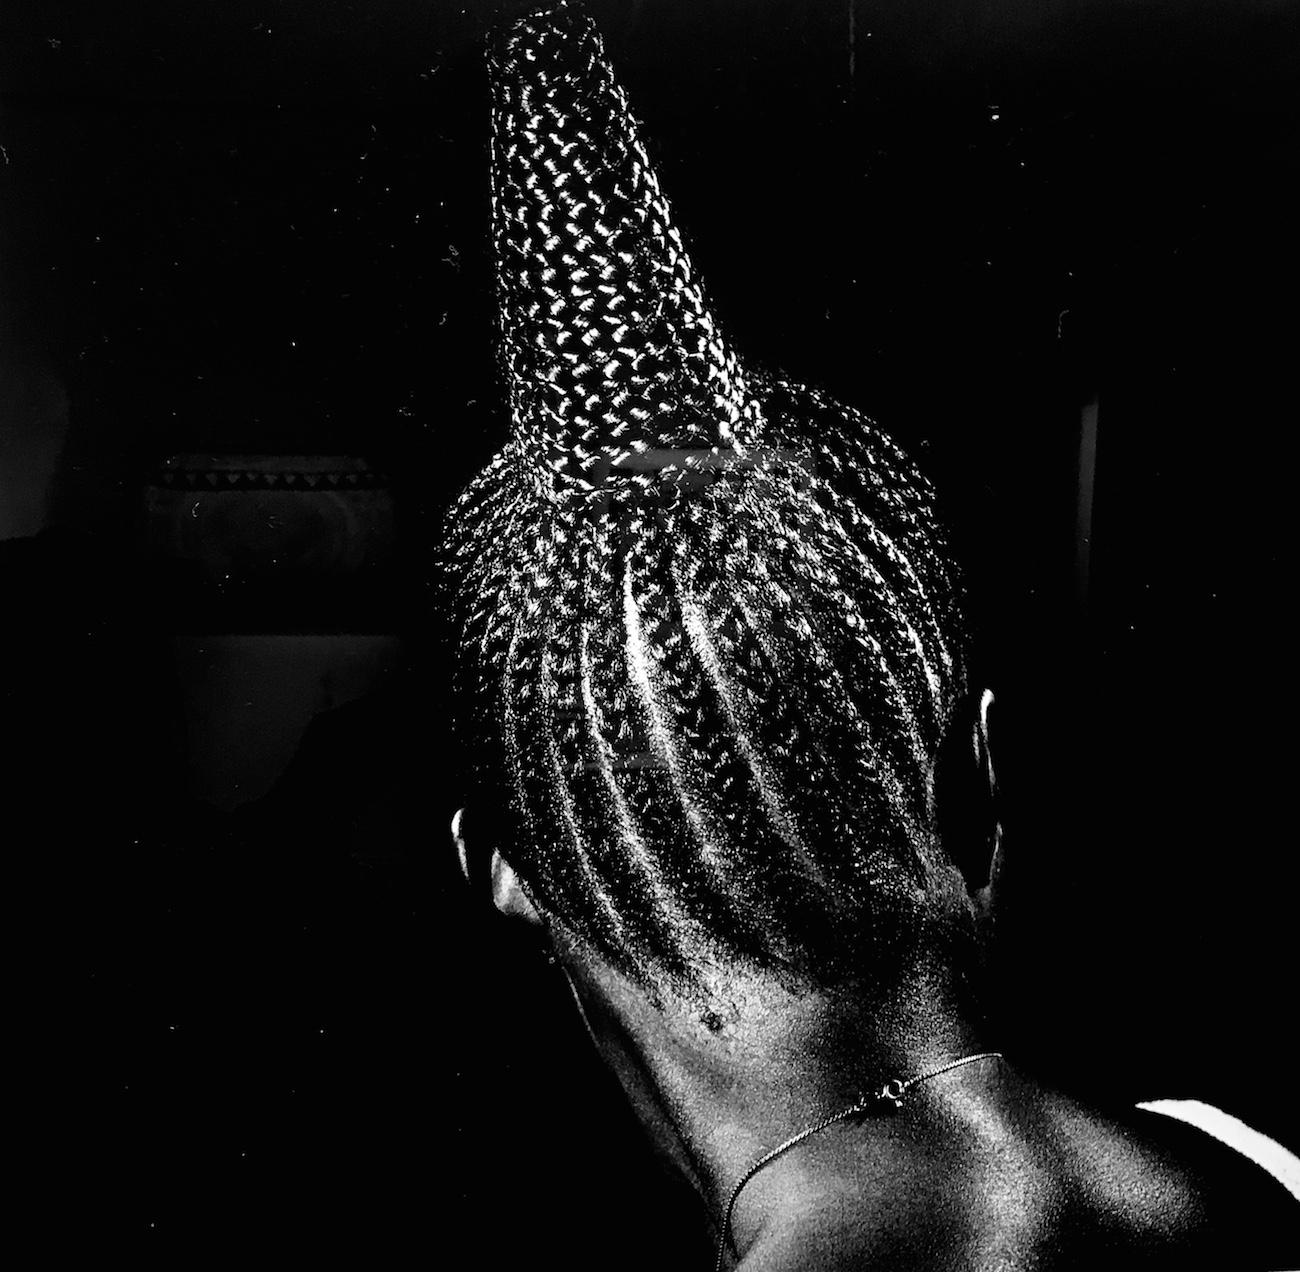 J.D. 'OKhai Ojeikere, Modern Suku, Hairstyle Series, 1979